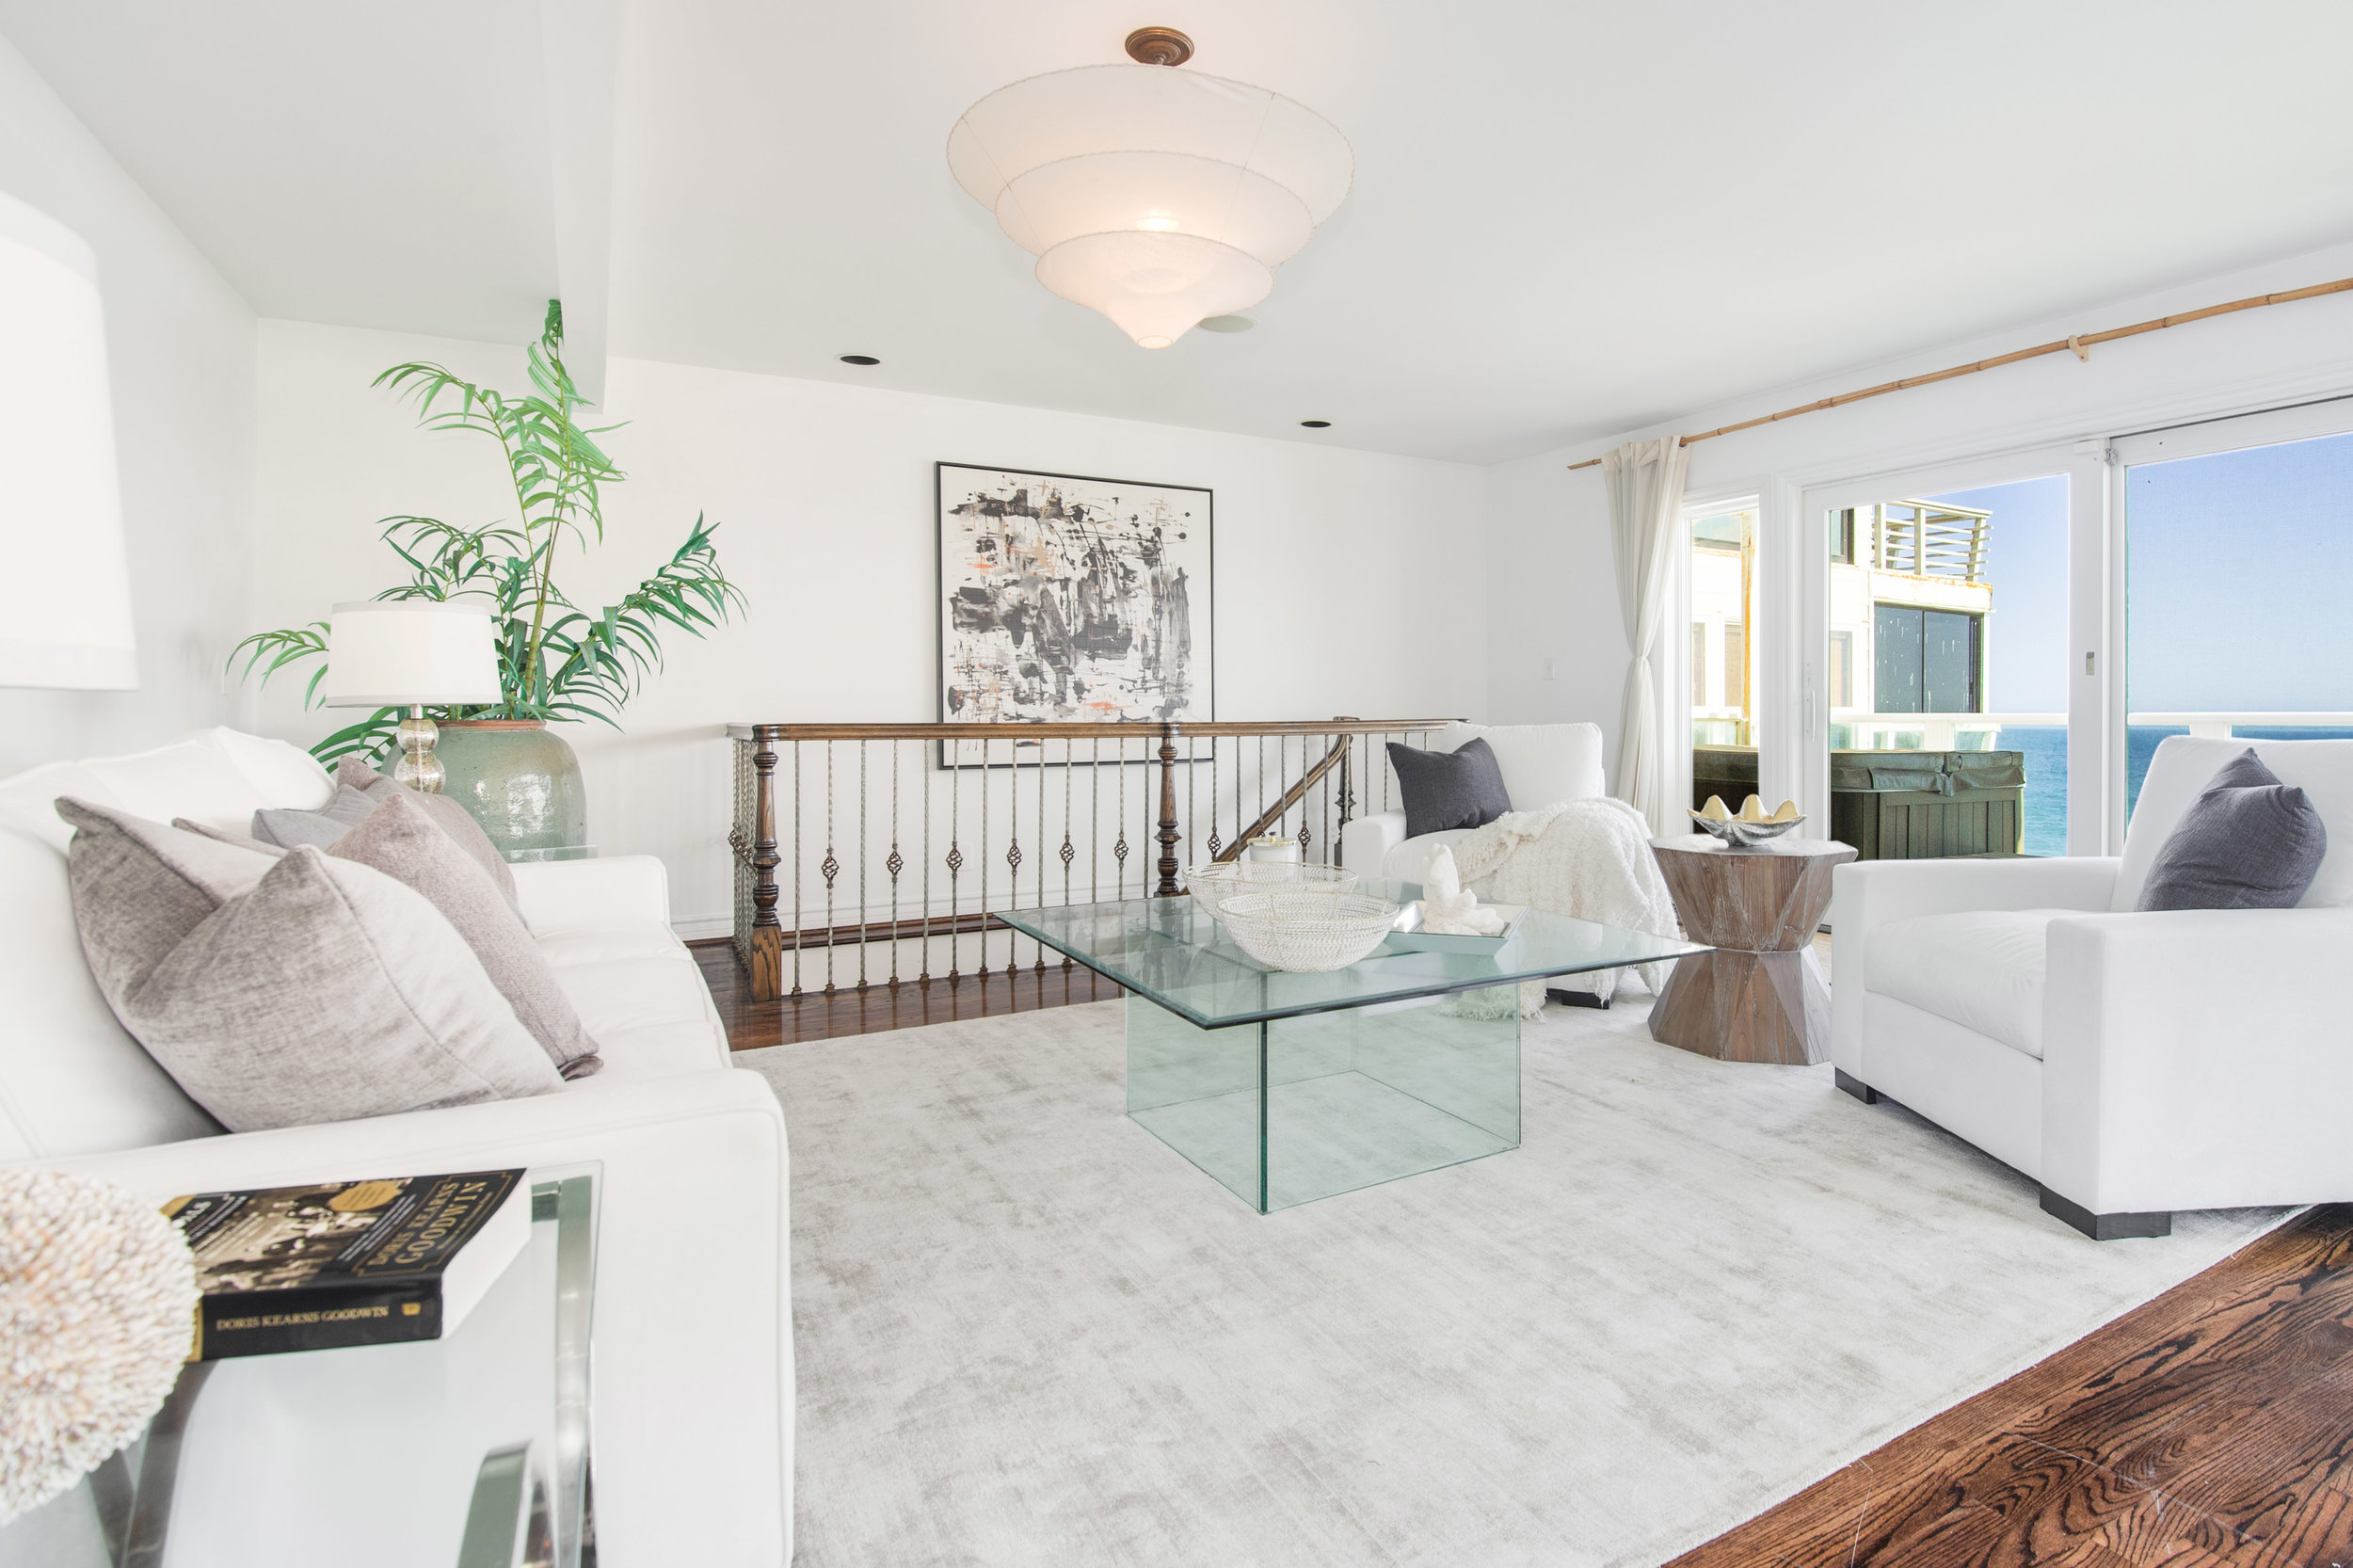 008 Living Room 25342 Malibu Road For Sale Lease The Malibu Life Team Luxury Real Estate.jpg